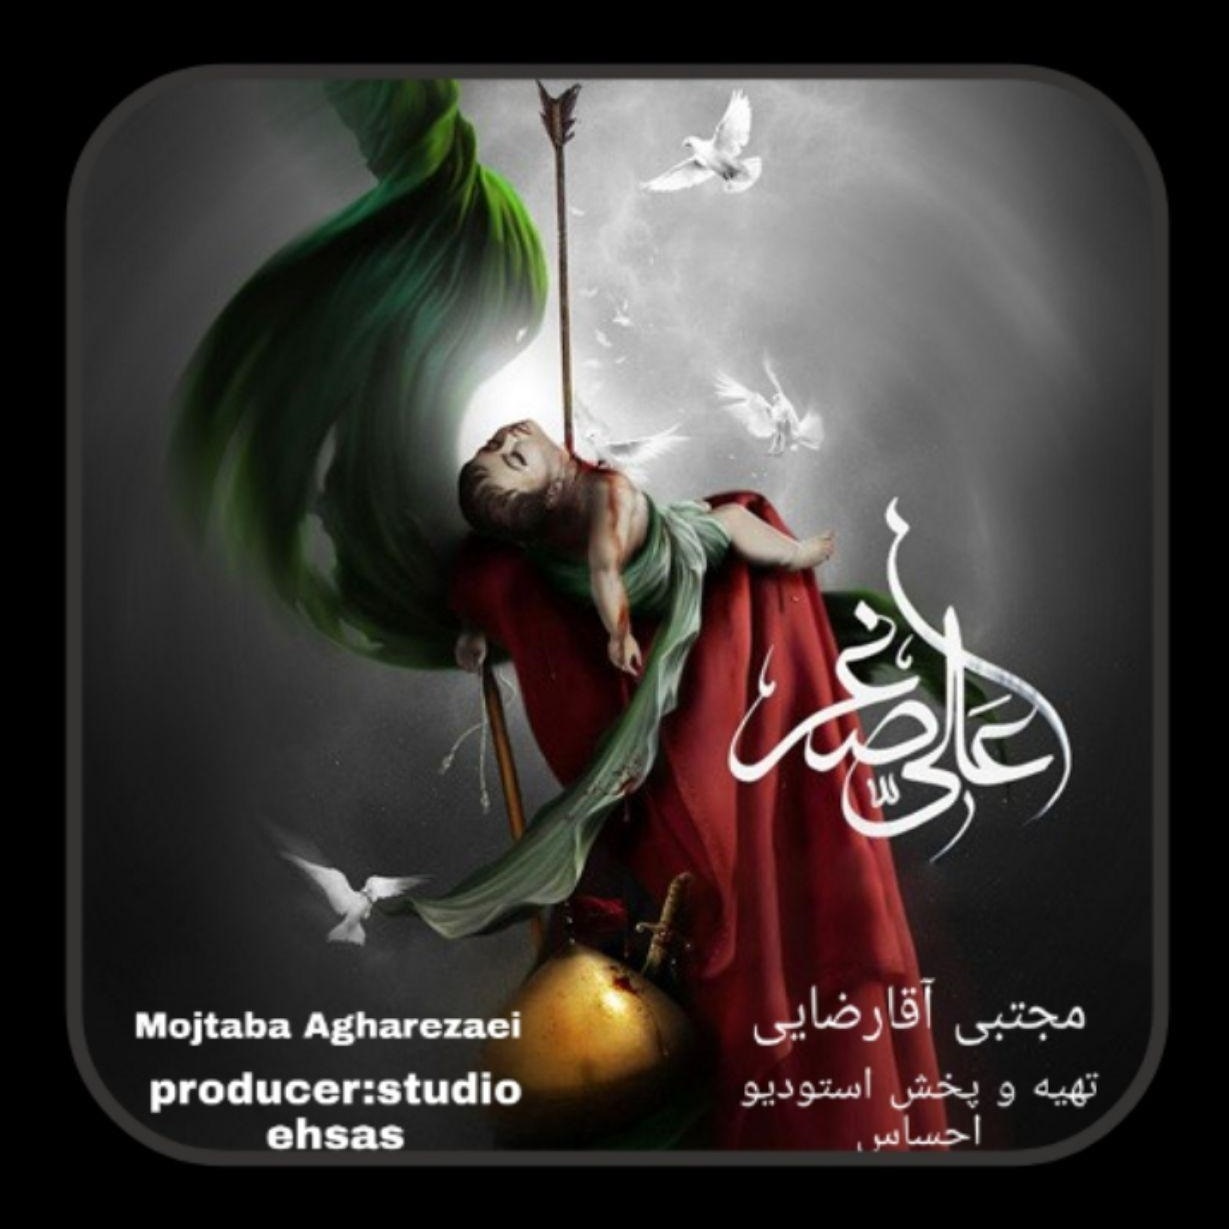 http://s2.picofile.com/file/8372198134/08Mojtaba_Agharezaei_Ali_Asqar.jpg